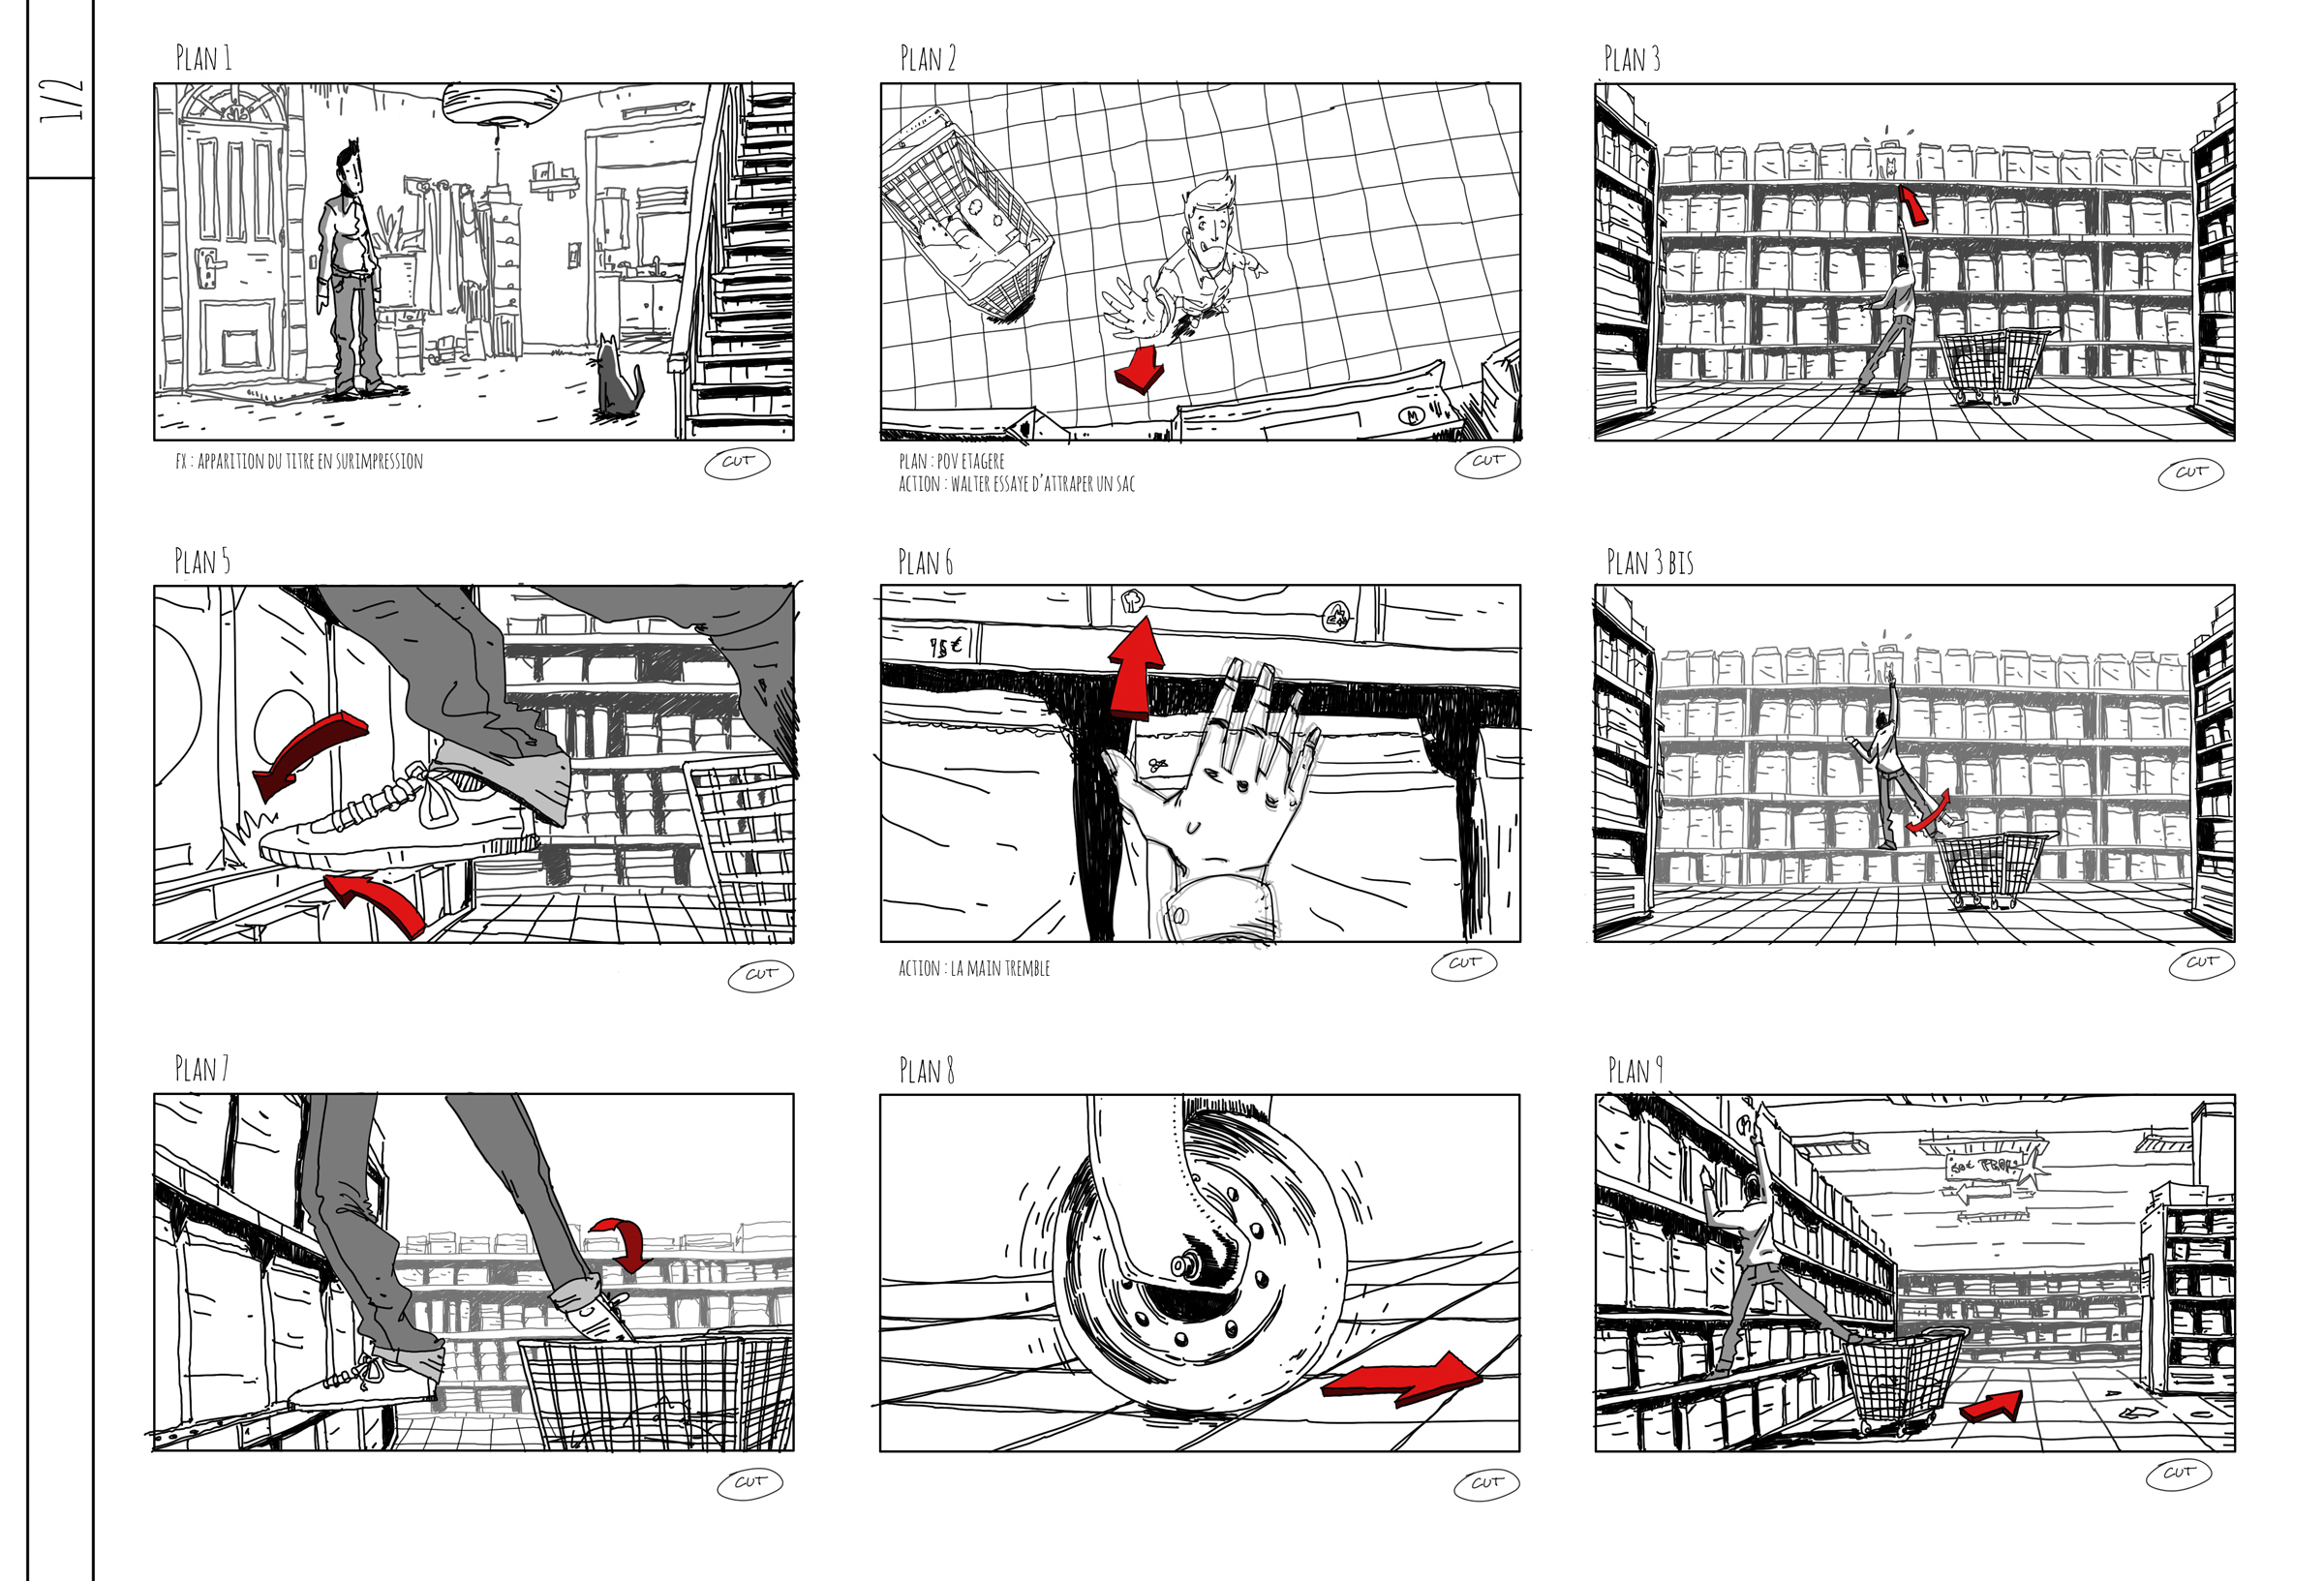 story board 02 - Projet 2 Wanimo - Romain Laforet